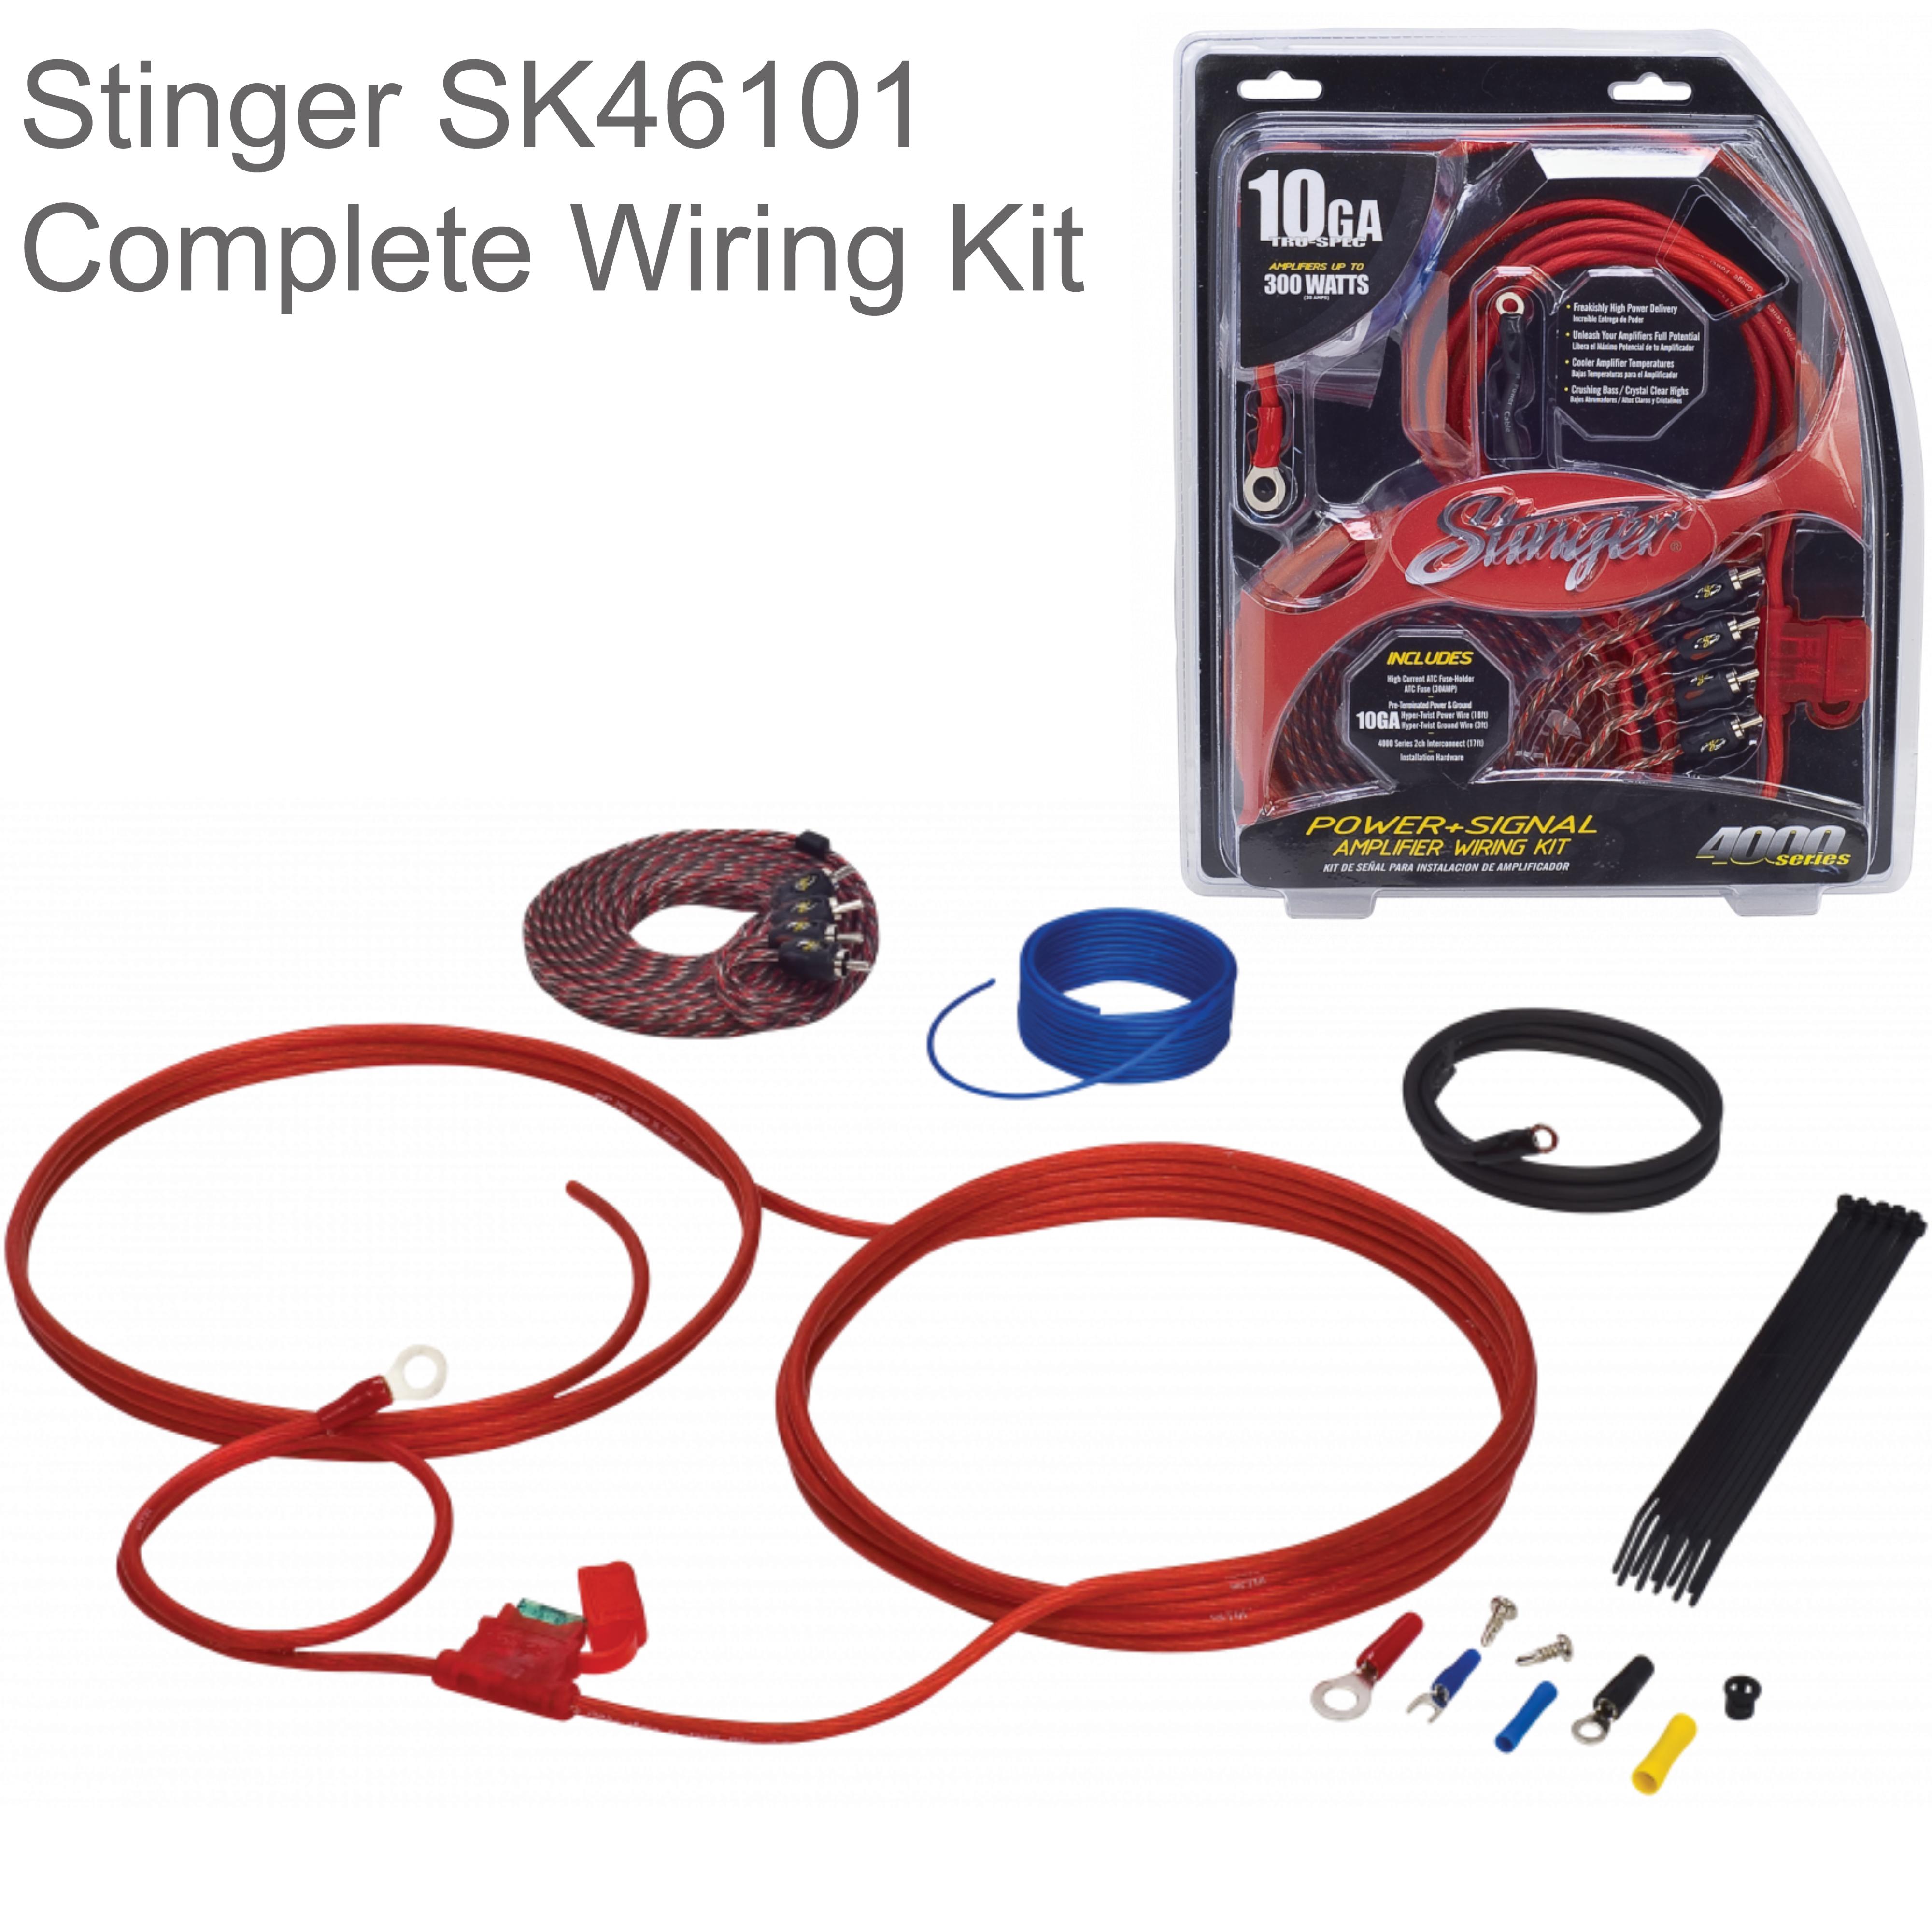 Stinger amplifier installation kits